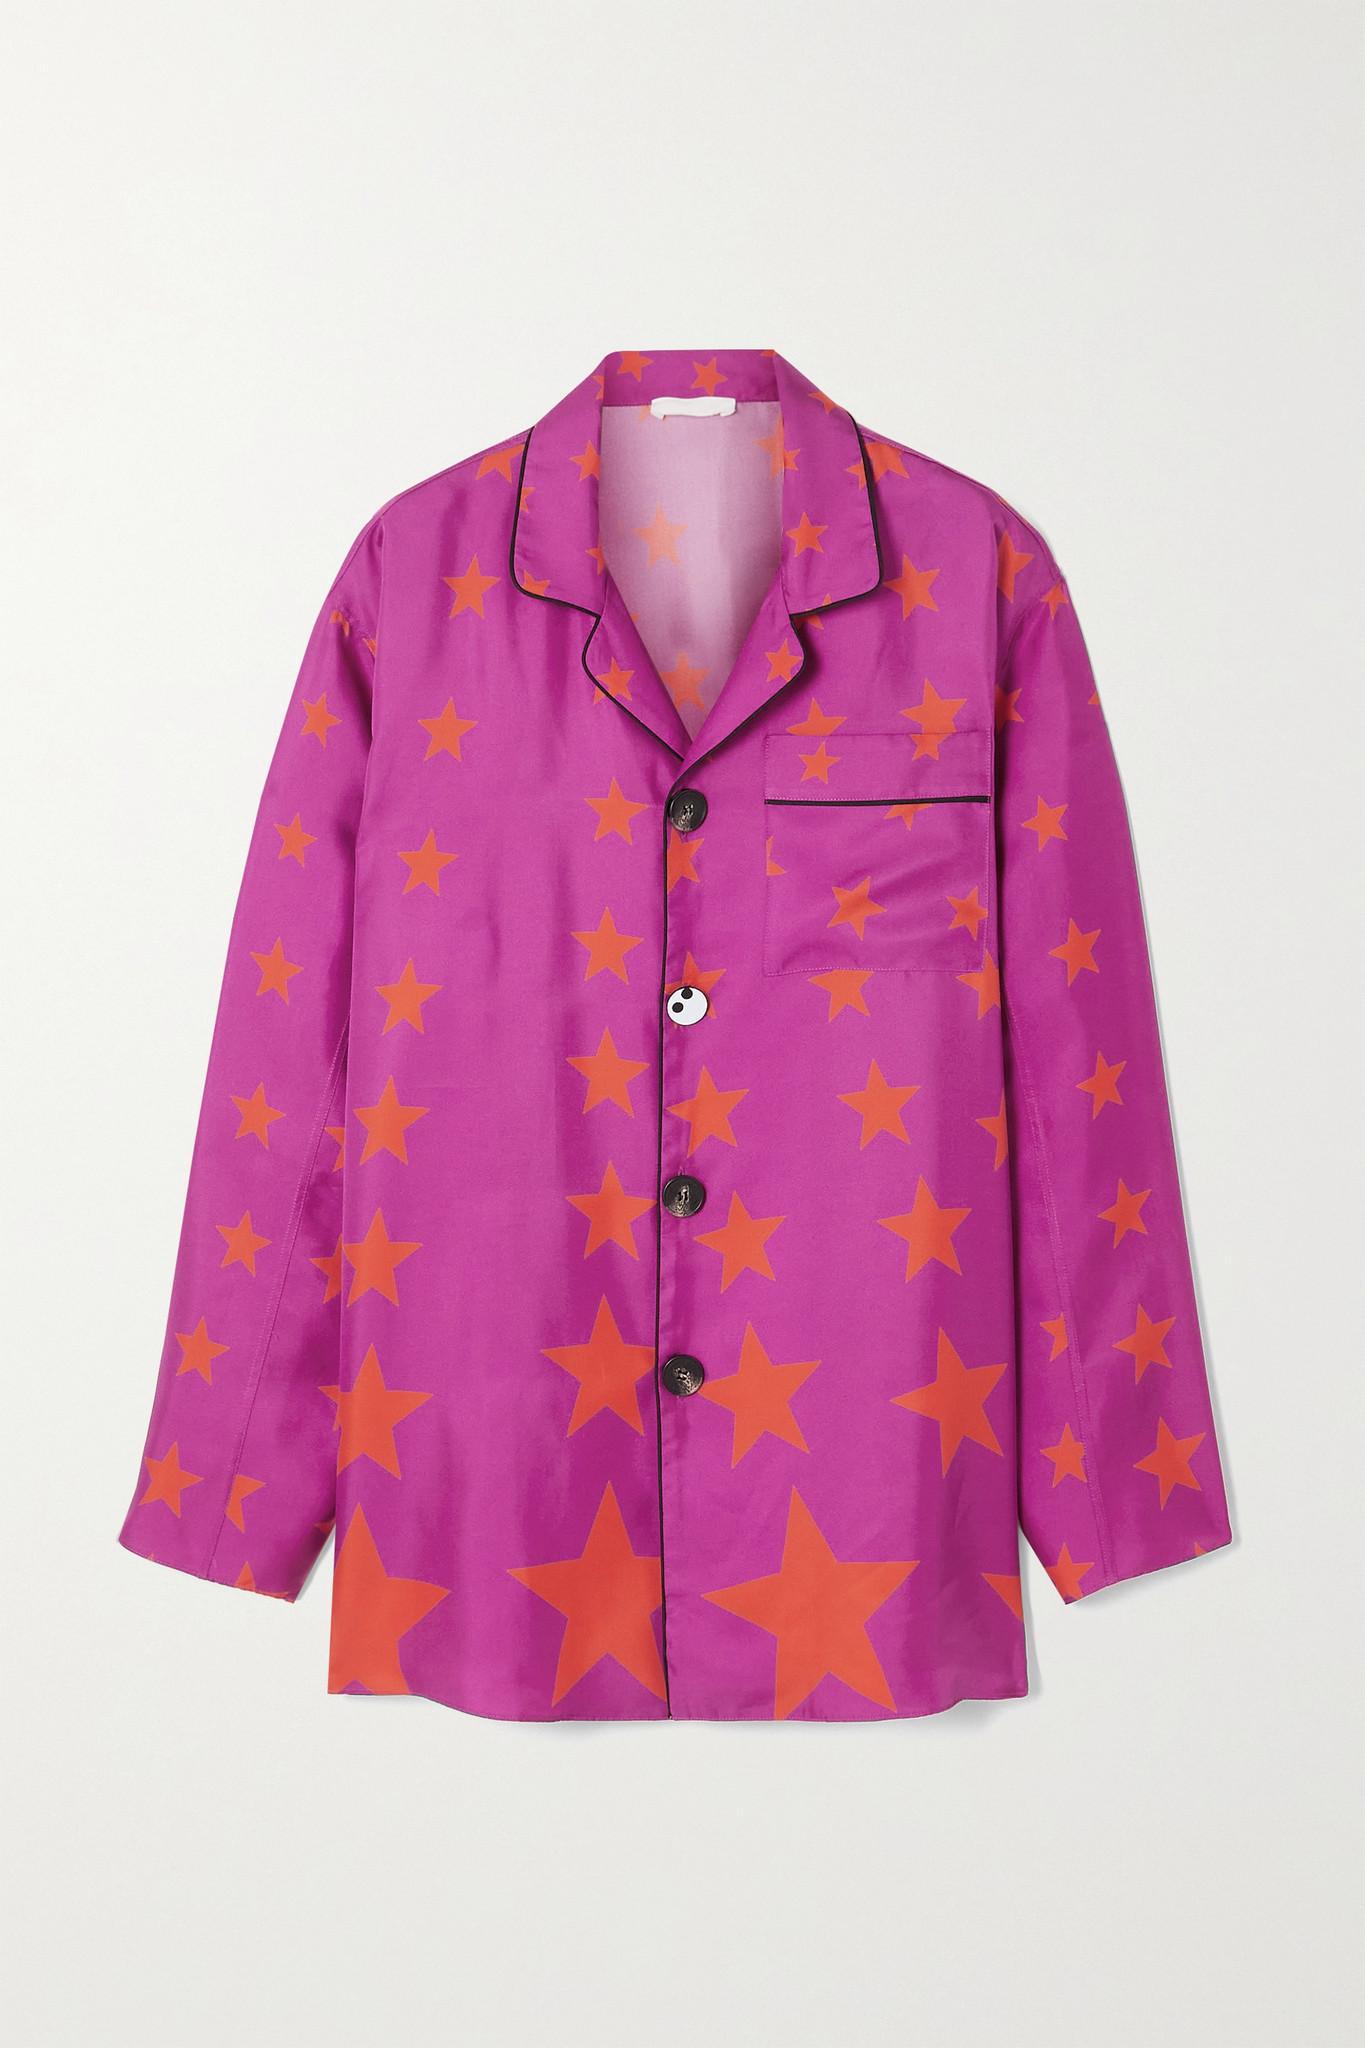 AZ FACTORY - Pijama Valentine Printed Silk-twill Shirt - Pink - FR34